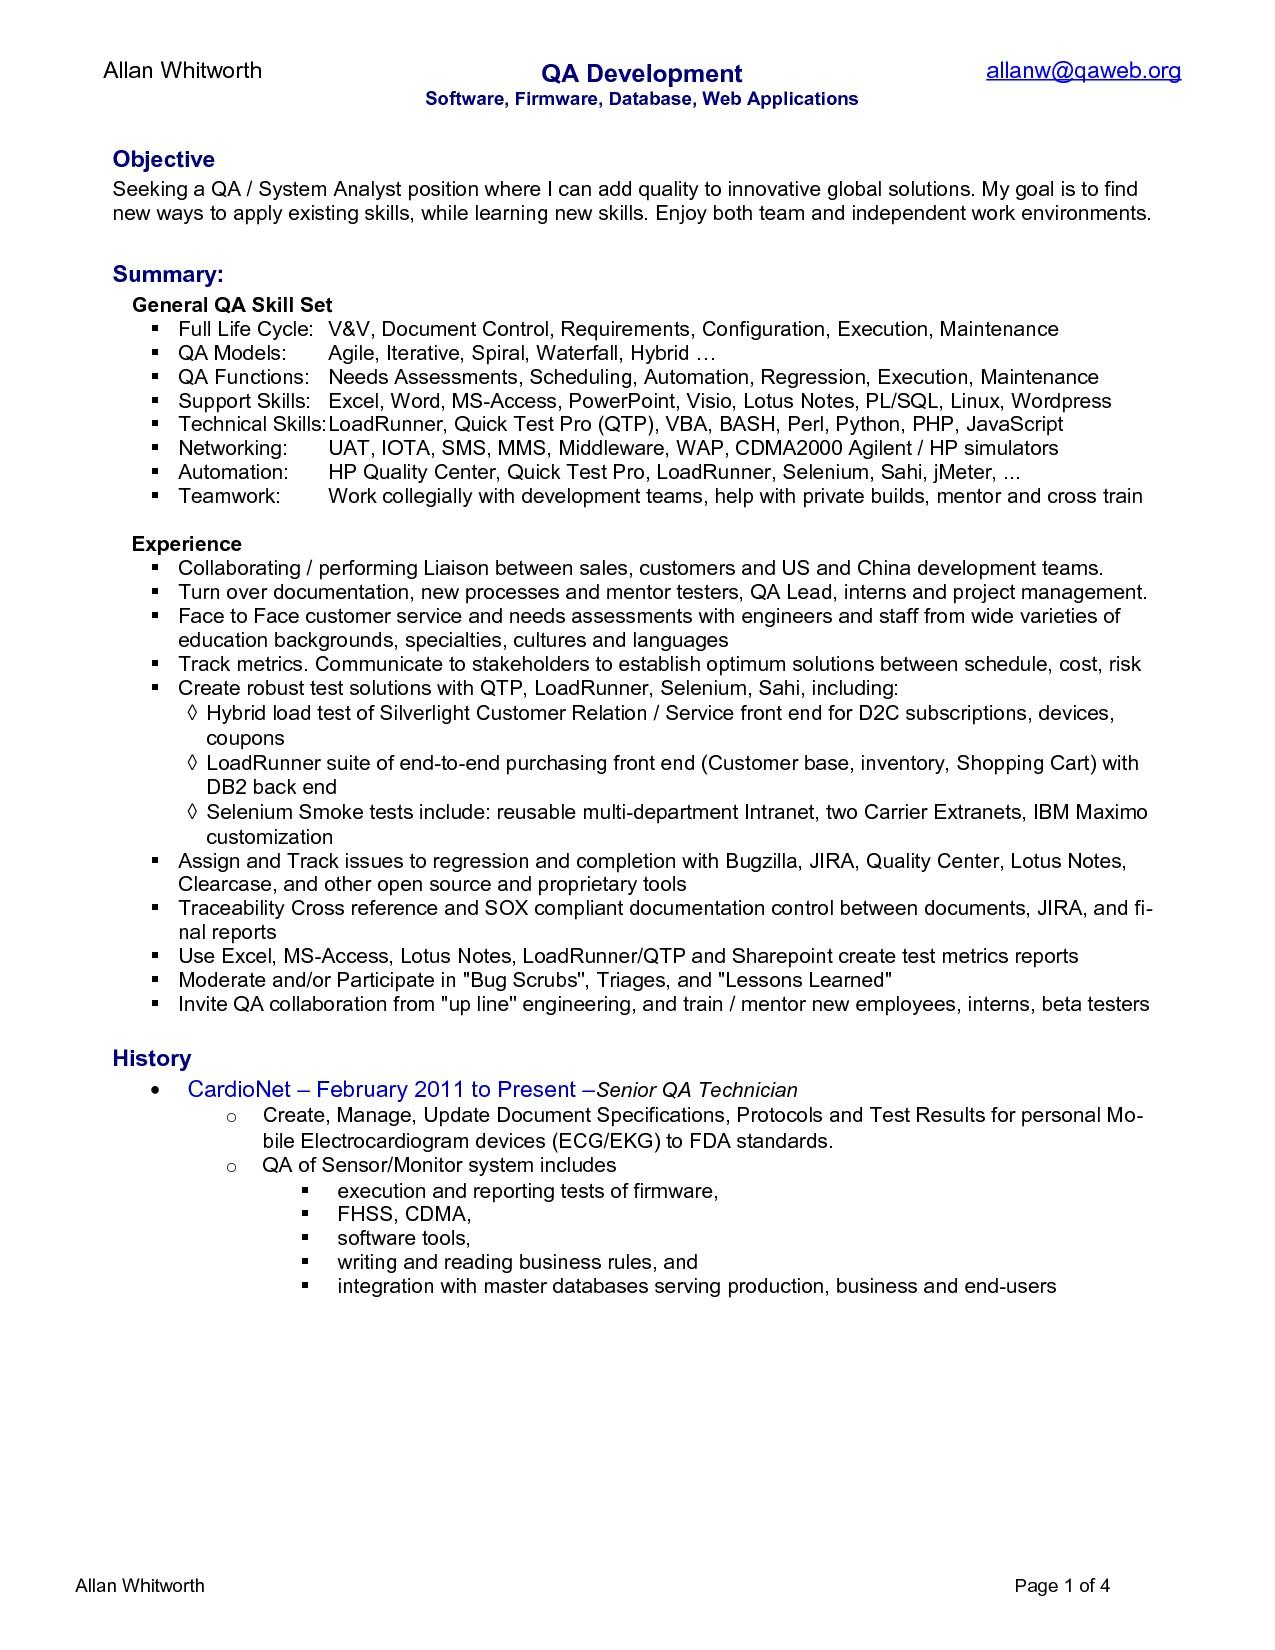 qa resume template  Qa Analyst Resume – printable planner template - qa resume template